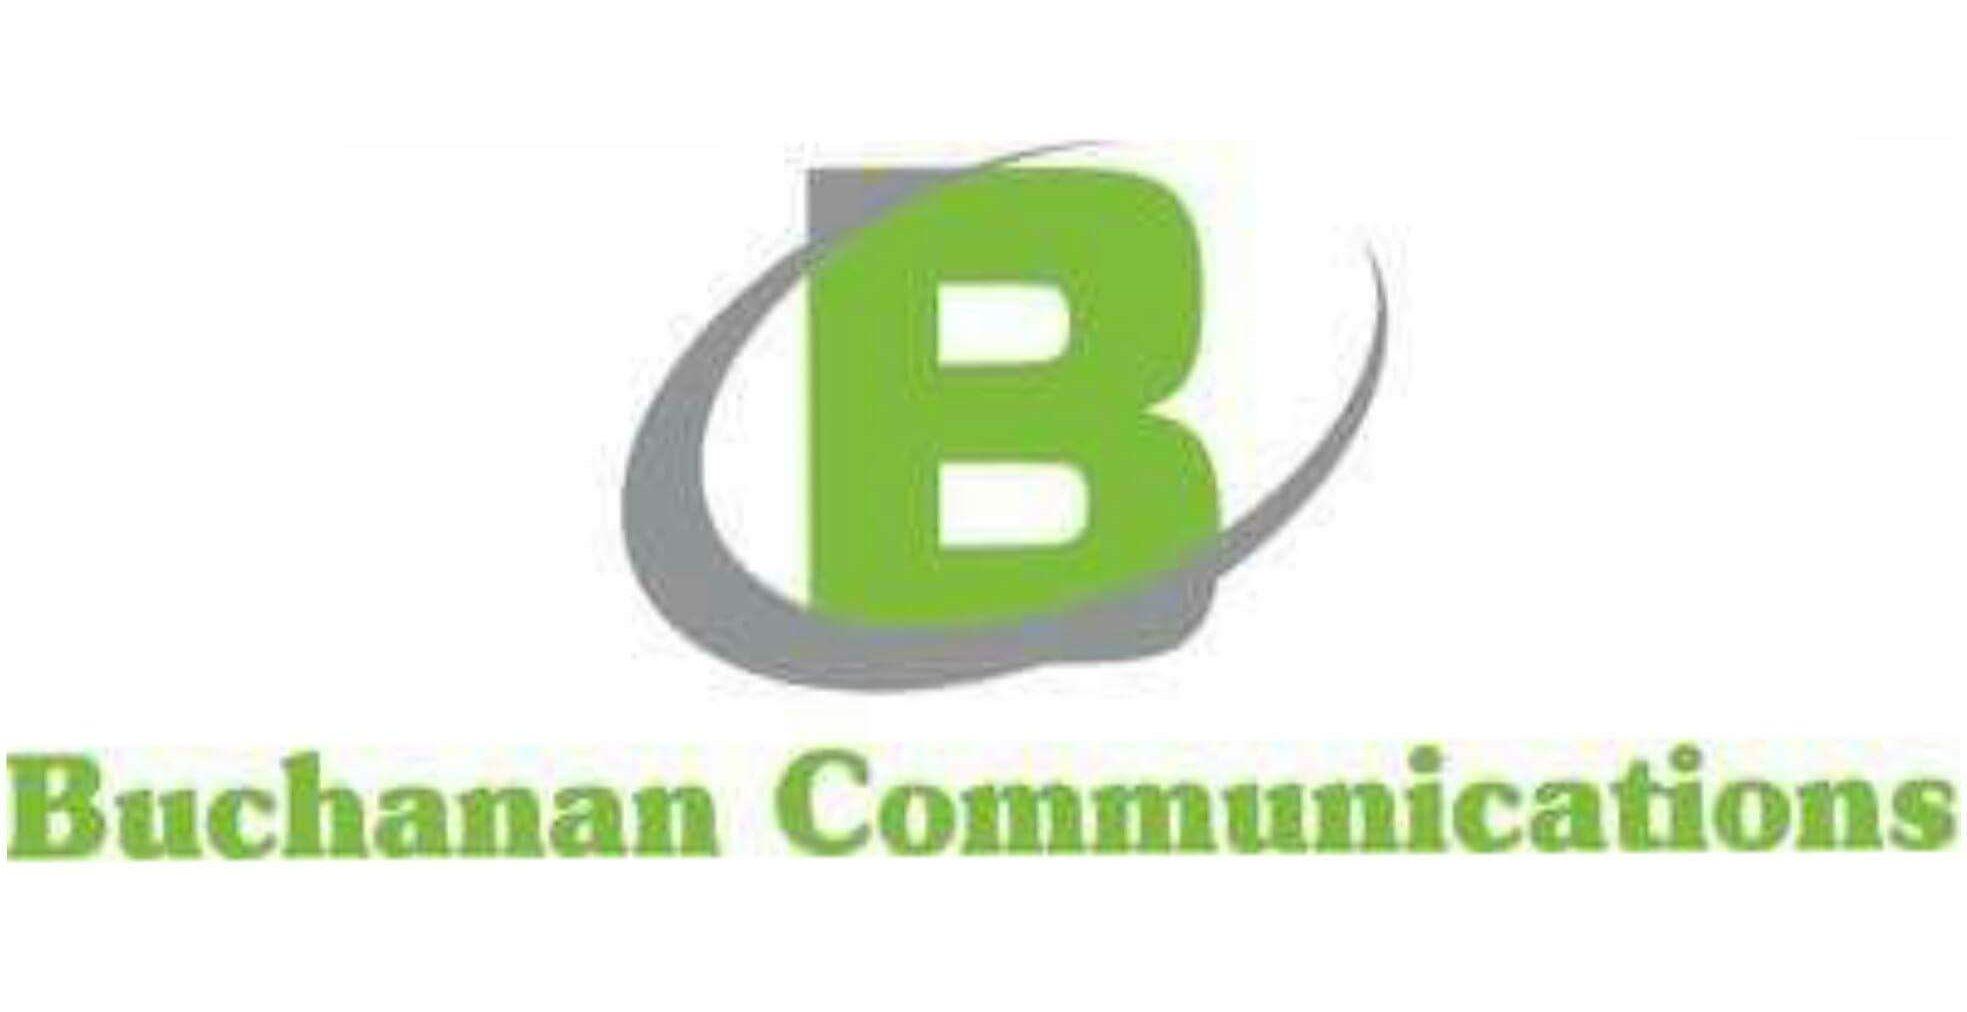 Buchanan Communications